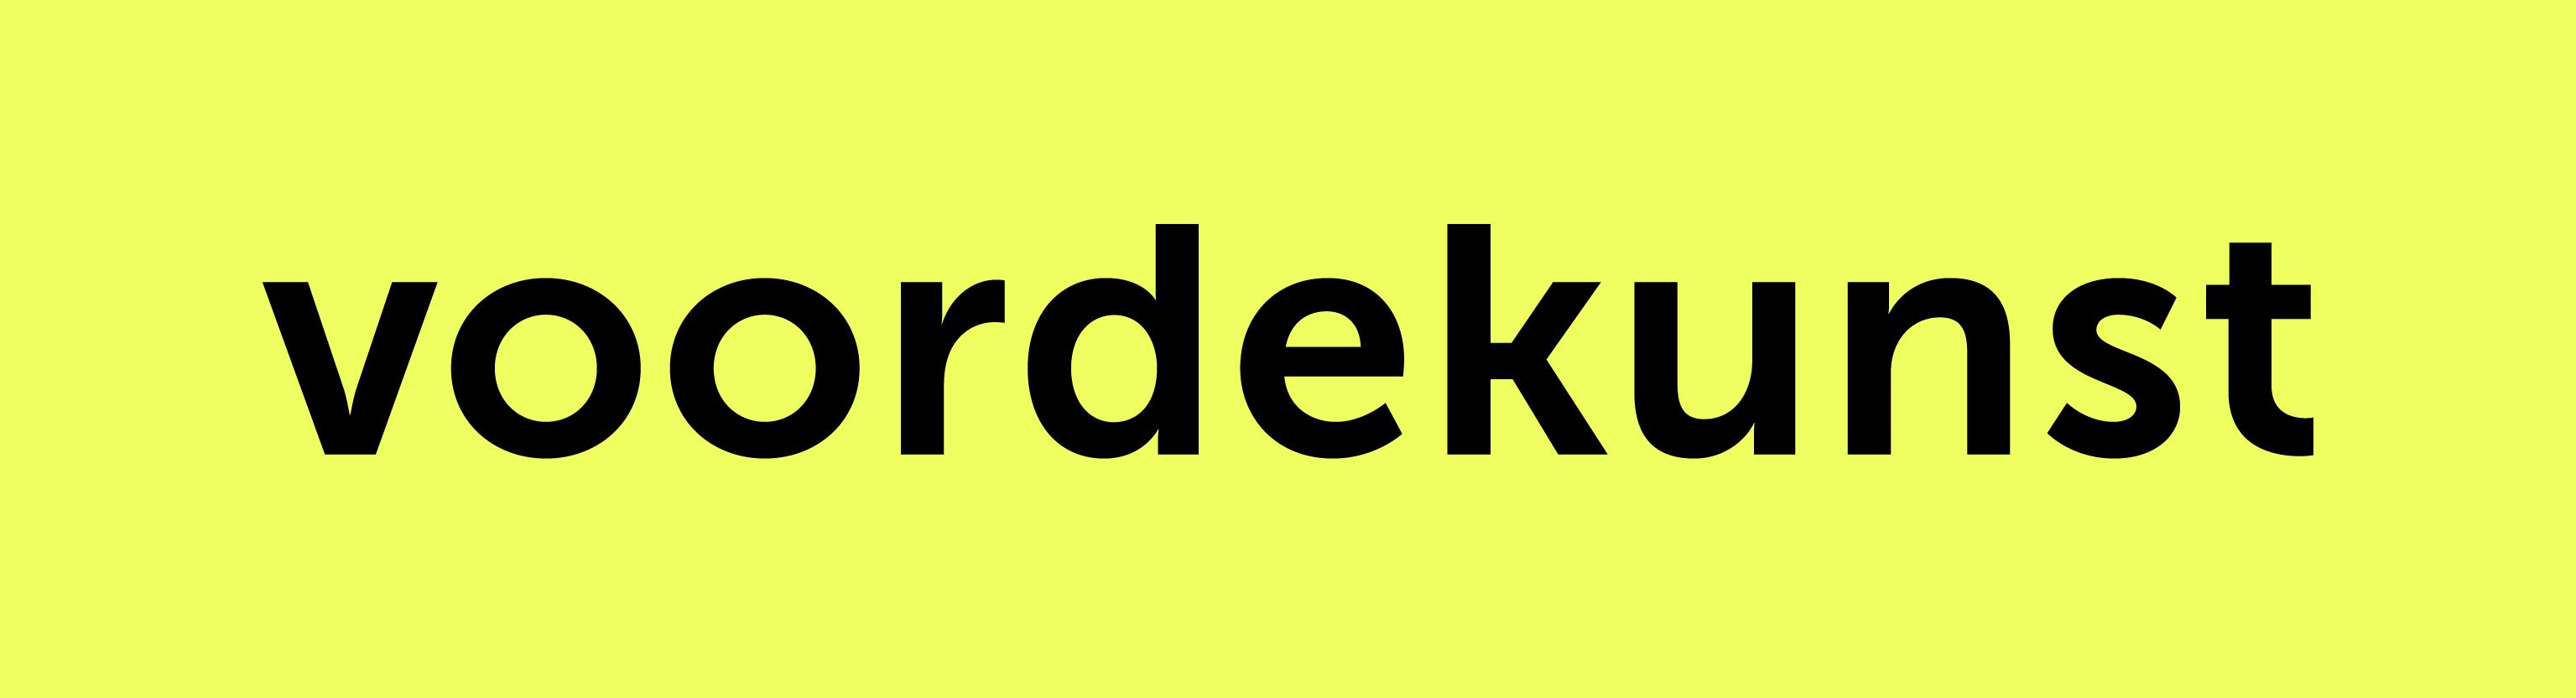 voordekunst_logo_regular_yellow